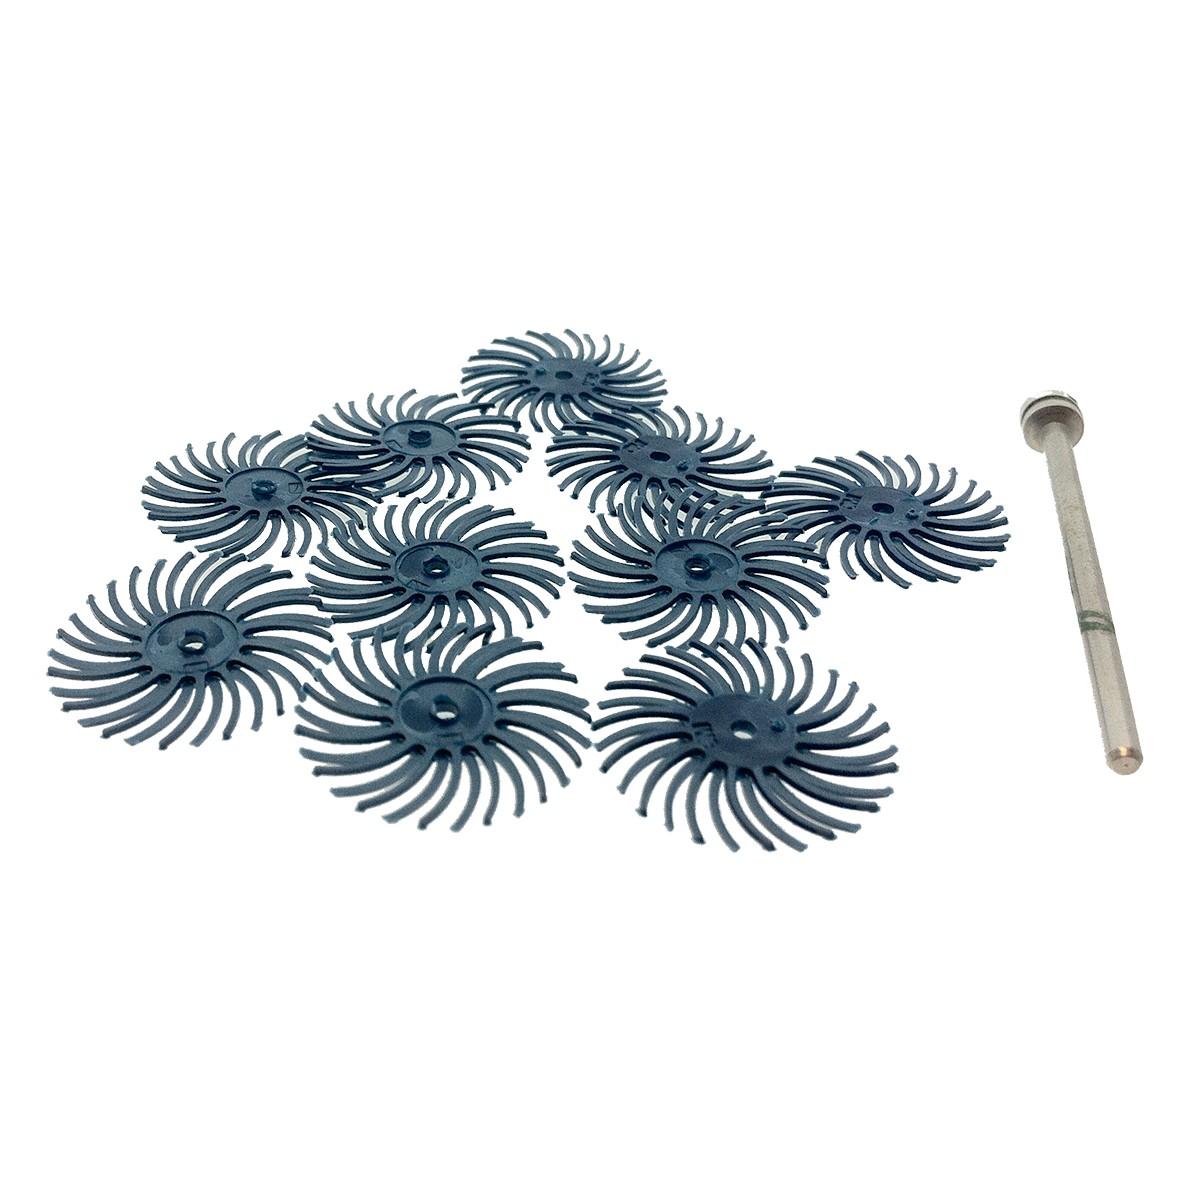 "3M Fine Blue 3/4"" Radial Bristle Discs"